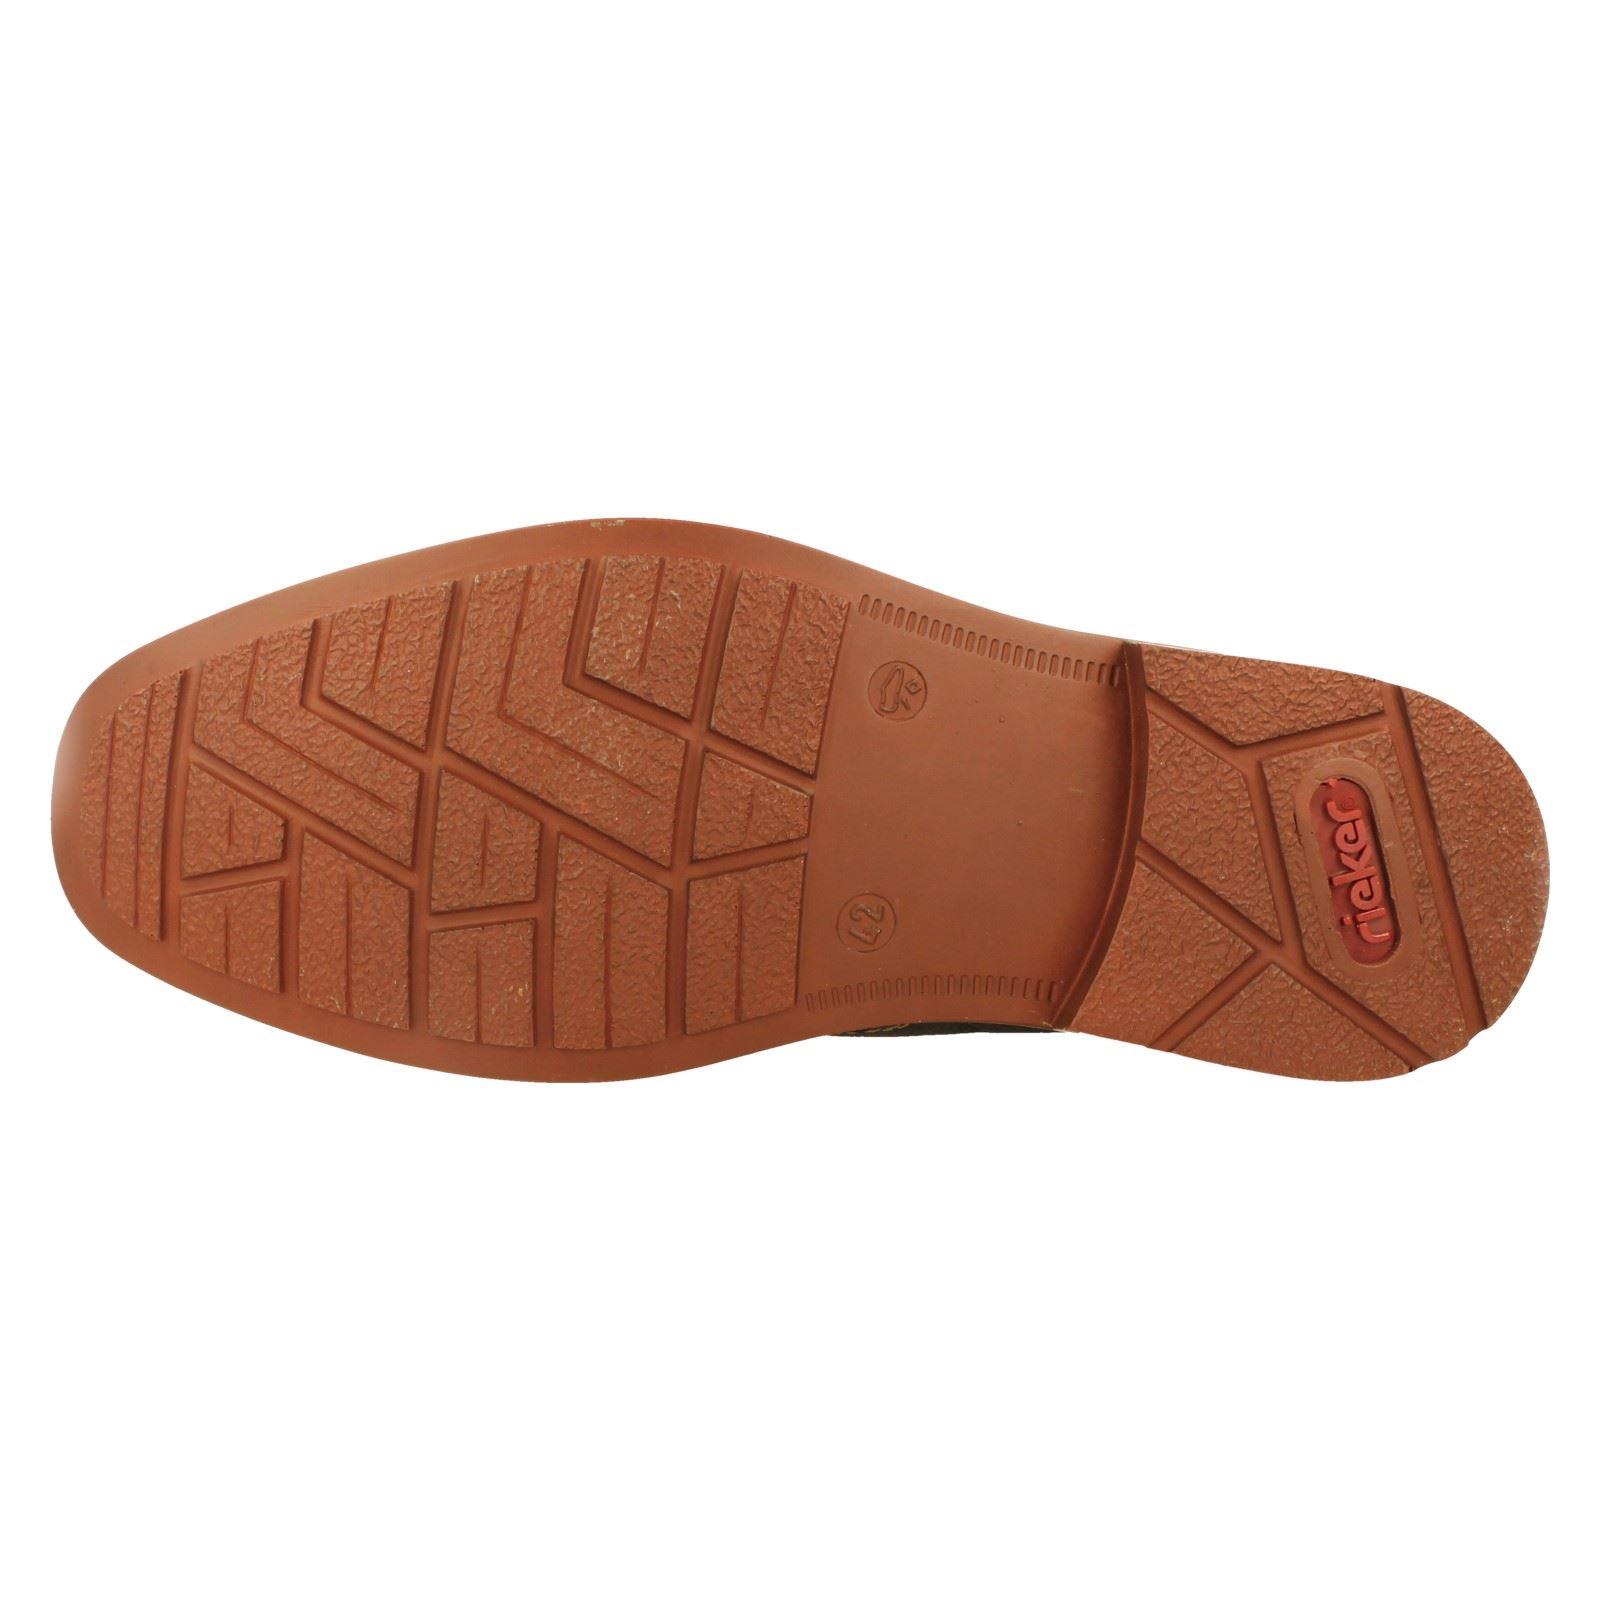 Botas al tobillo para Hombre Rieker estilo estilo Rieker F1210-W 237a12